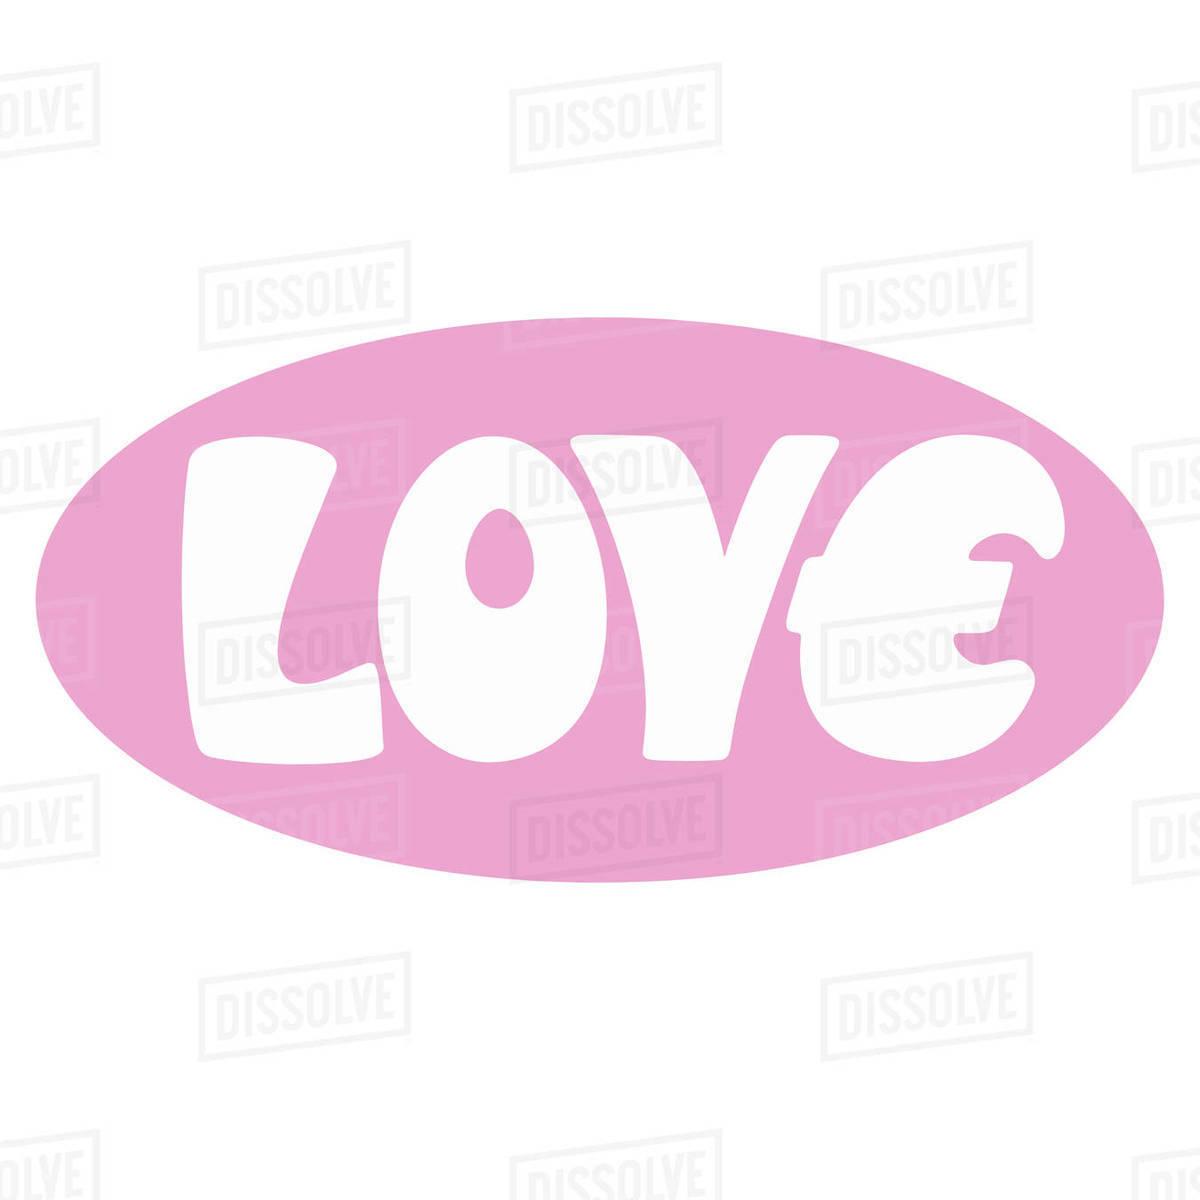 Illustration of love logo isolated on white background Royalty-free stock photo